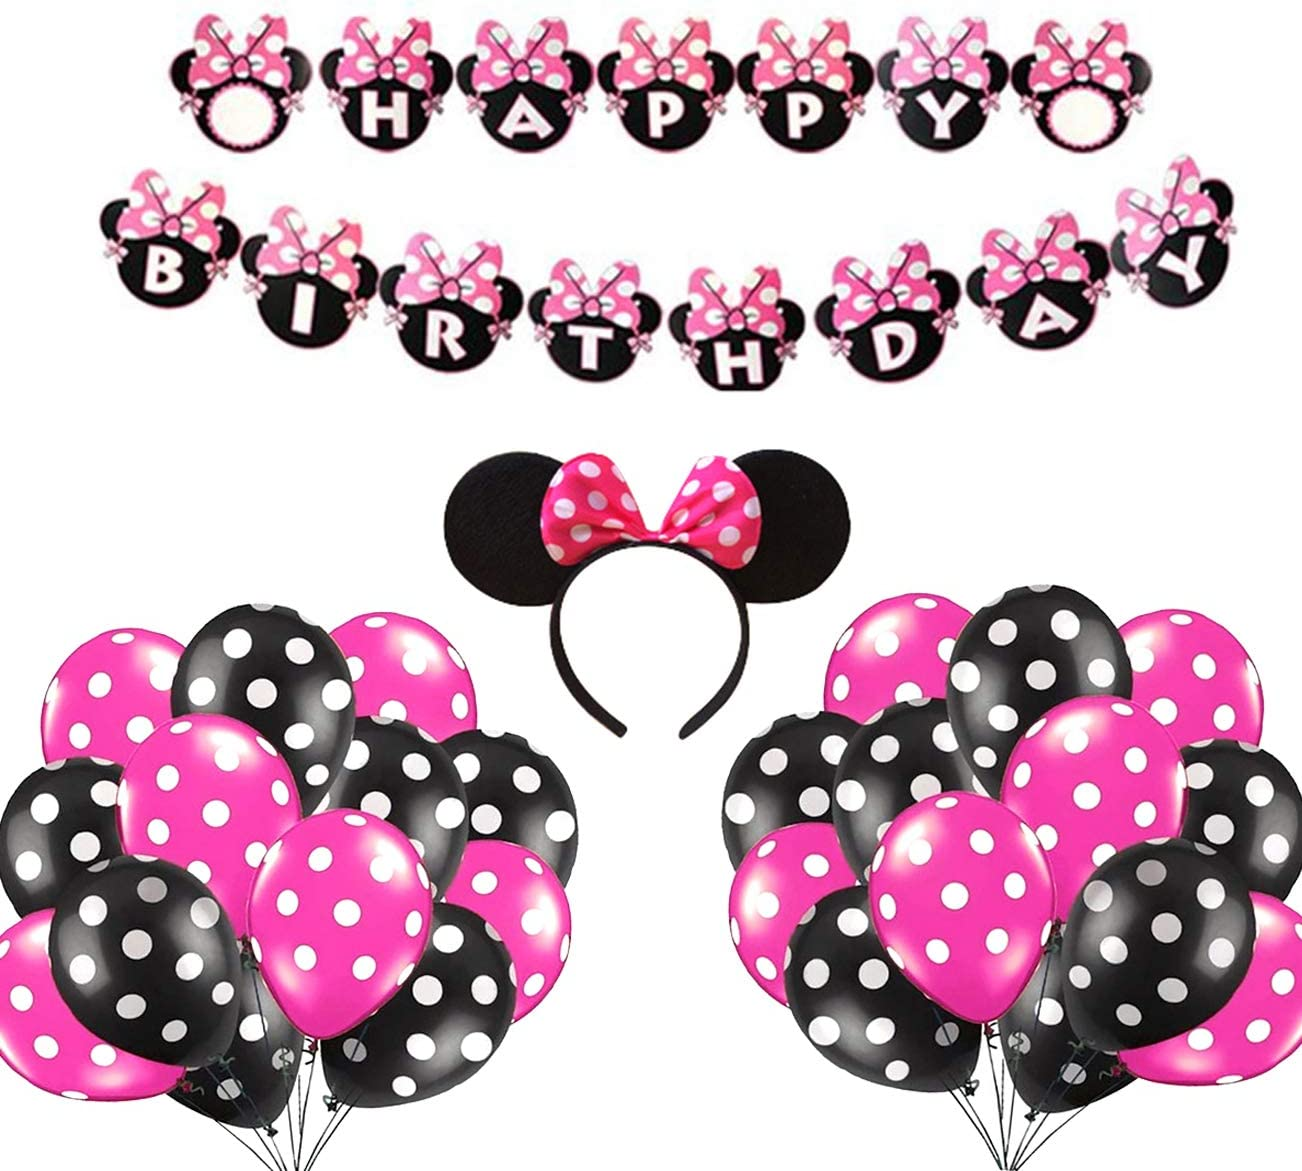 Minnie Mouse Diadema Para Fiesta De Cumpleaños Accesorios De Decoración De Minnie Mouse Con Diseño De Mickey Mouse Para Fiestas De Cumpleaños O Cumpleaños Toys Games